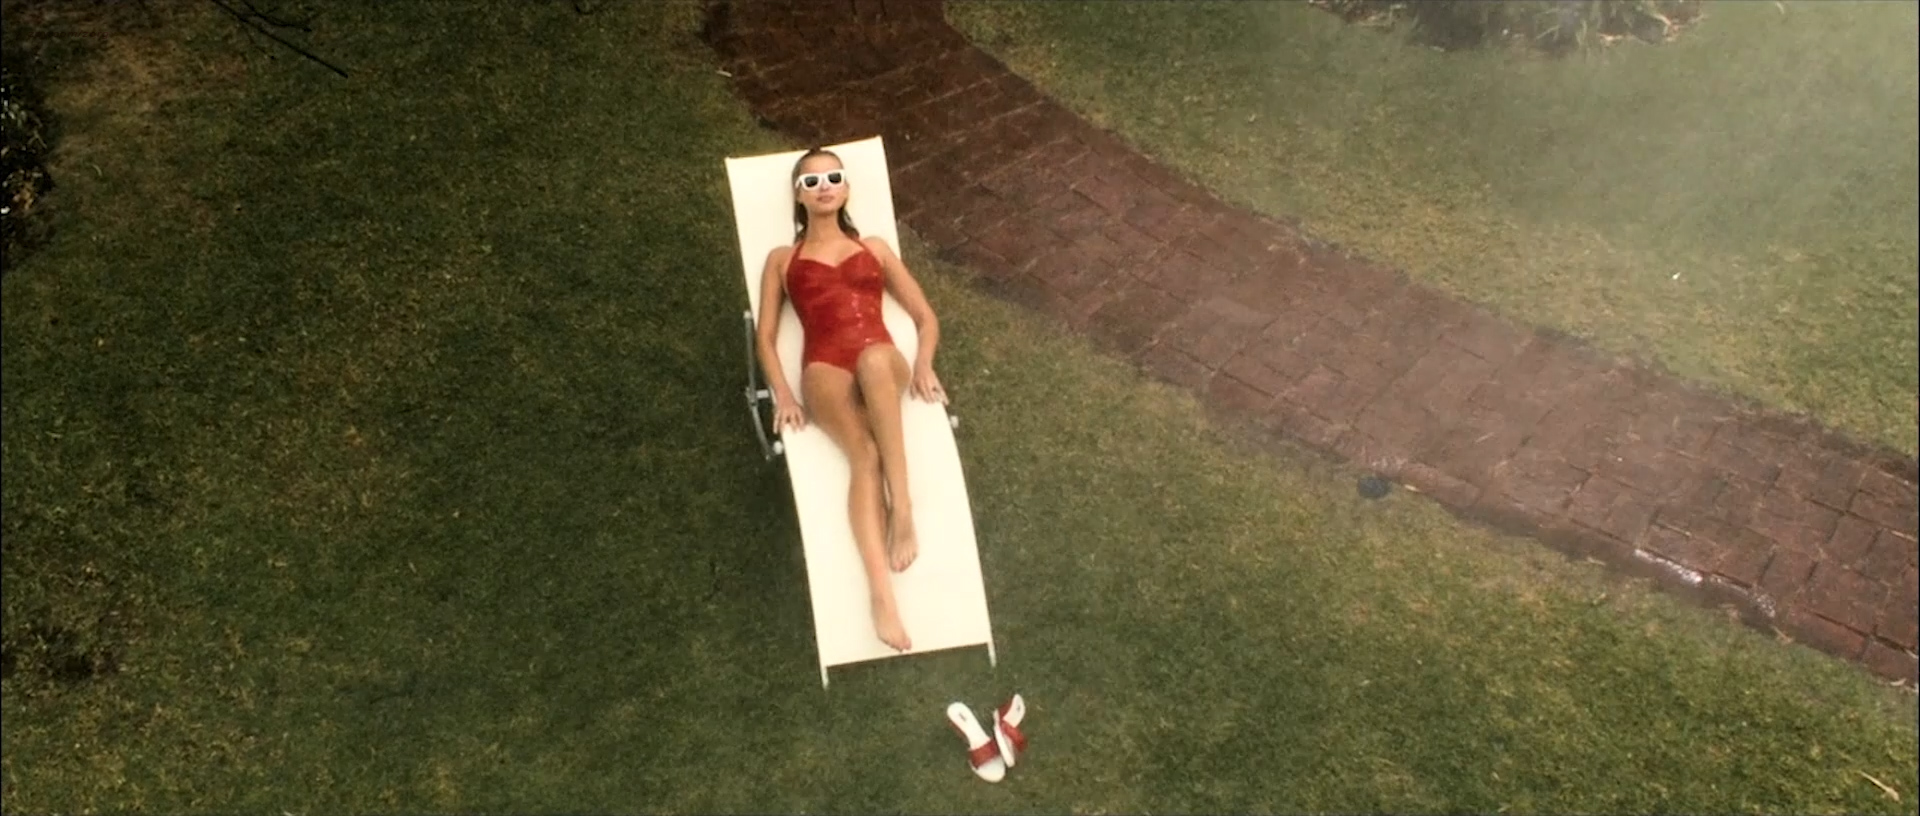 Tahyna Tozzi hot and wet and Kristi-Lee Kalendra nude topless - Beautiful (AU-2009) 1080p BluRay (8)